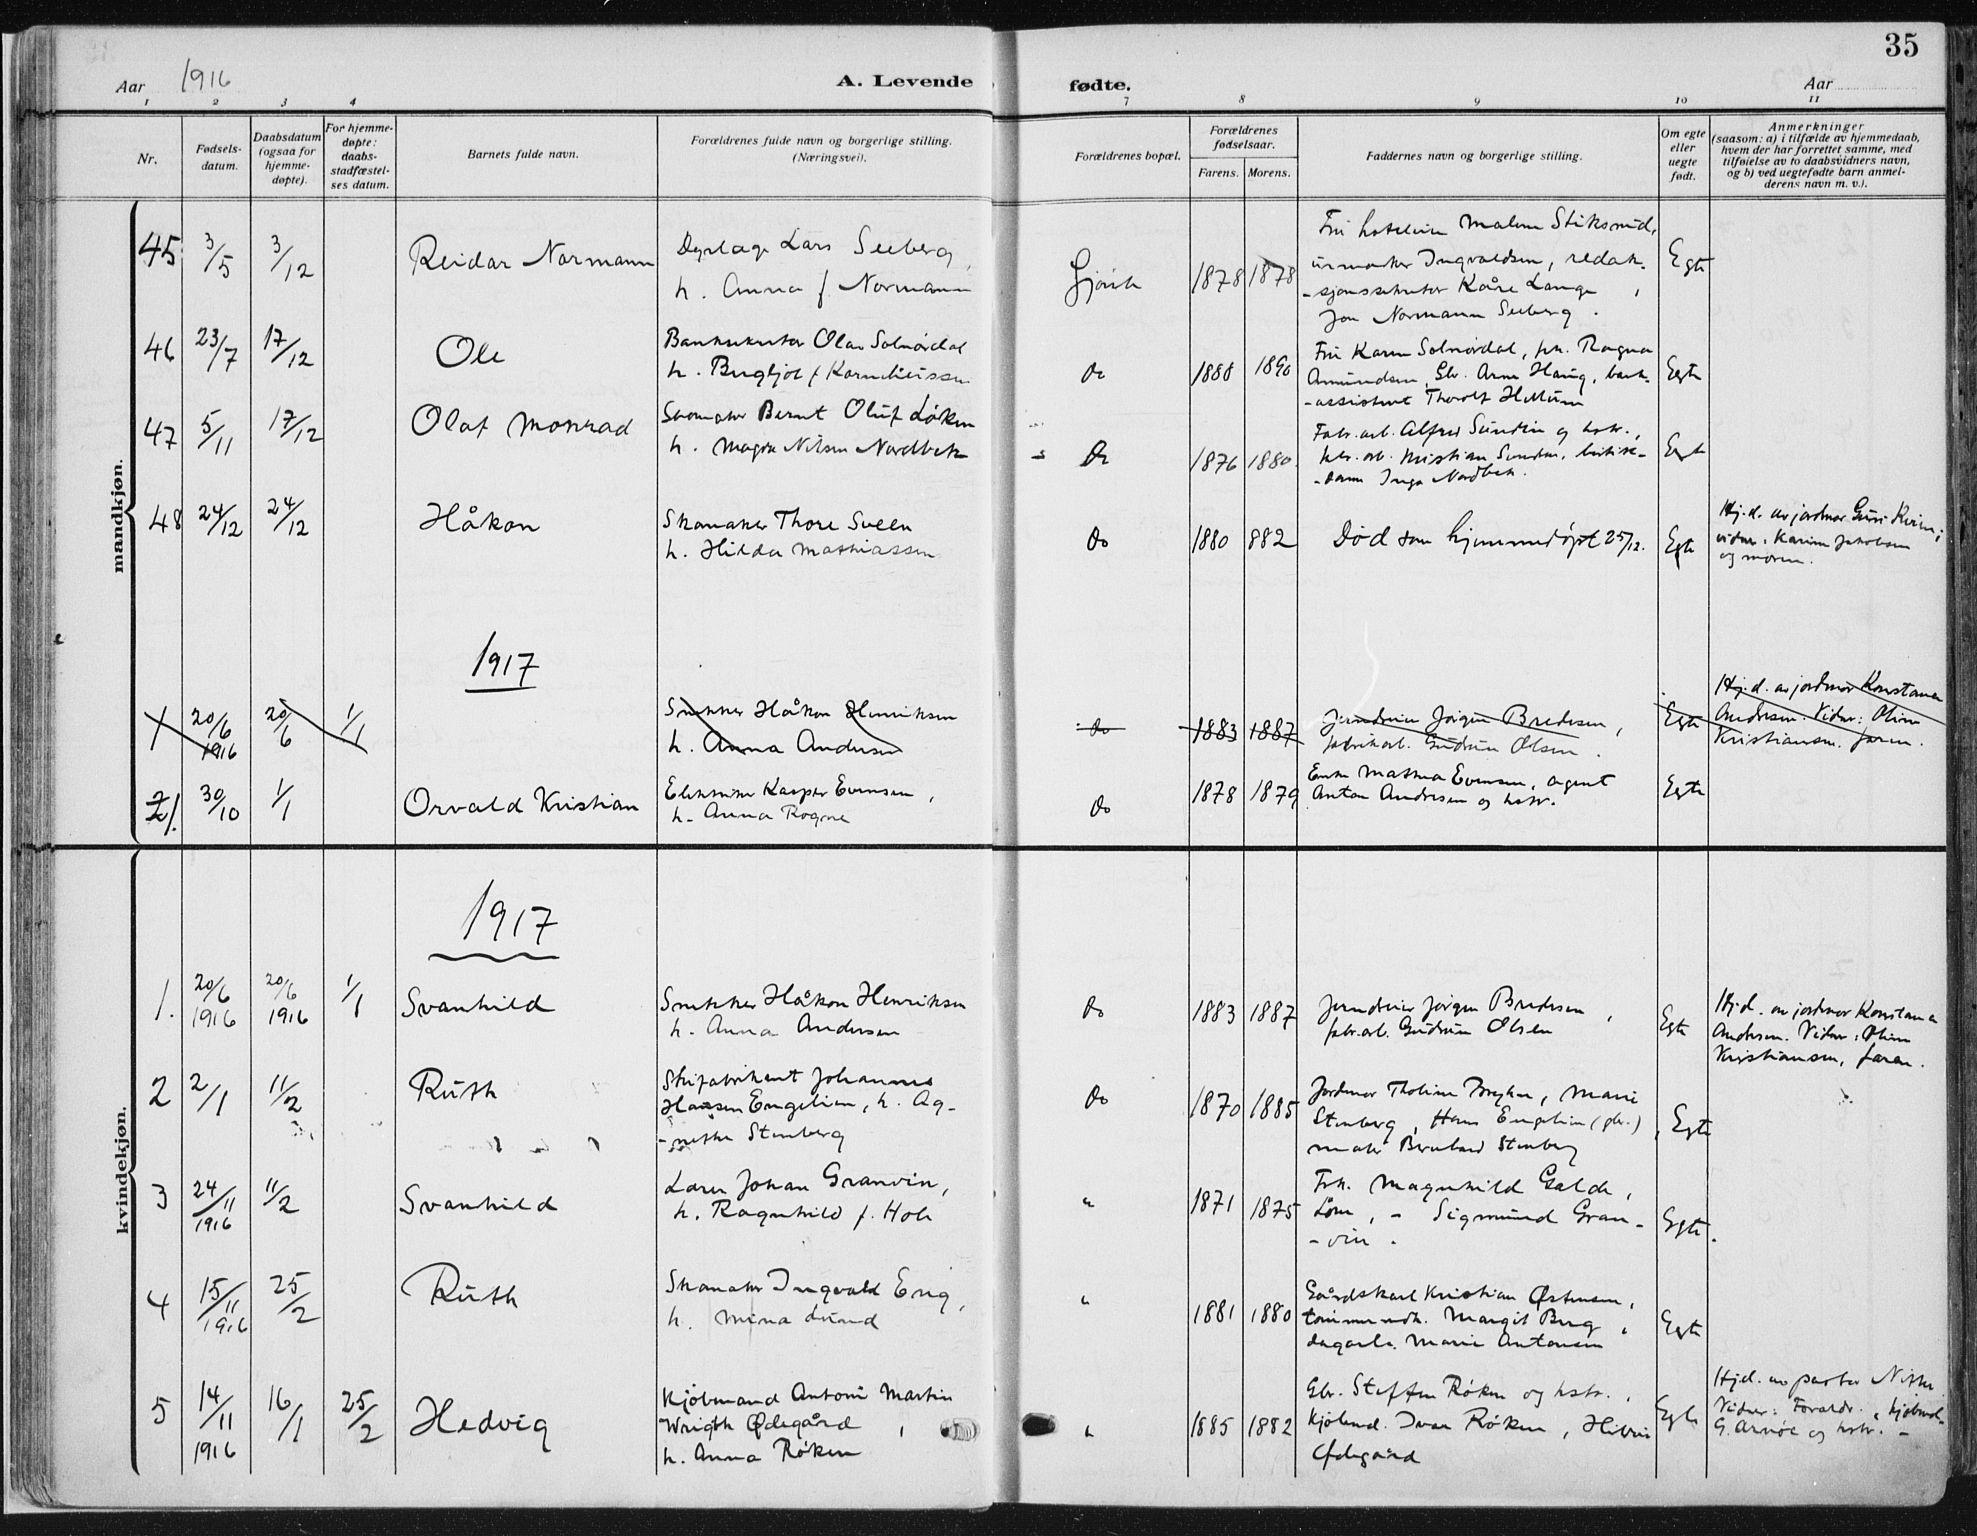 SAH, Vardal prestekontor, H/Ha/Haa/L0014: Ministerialbok nr. 14, 1912-1922, s. 35